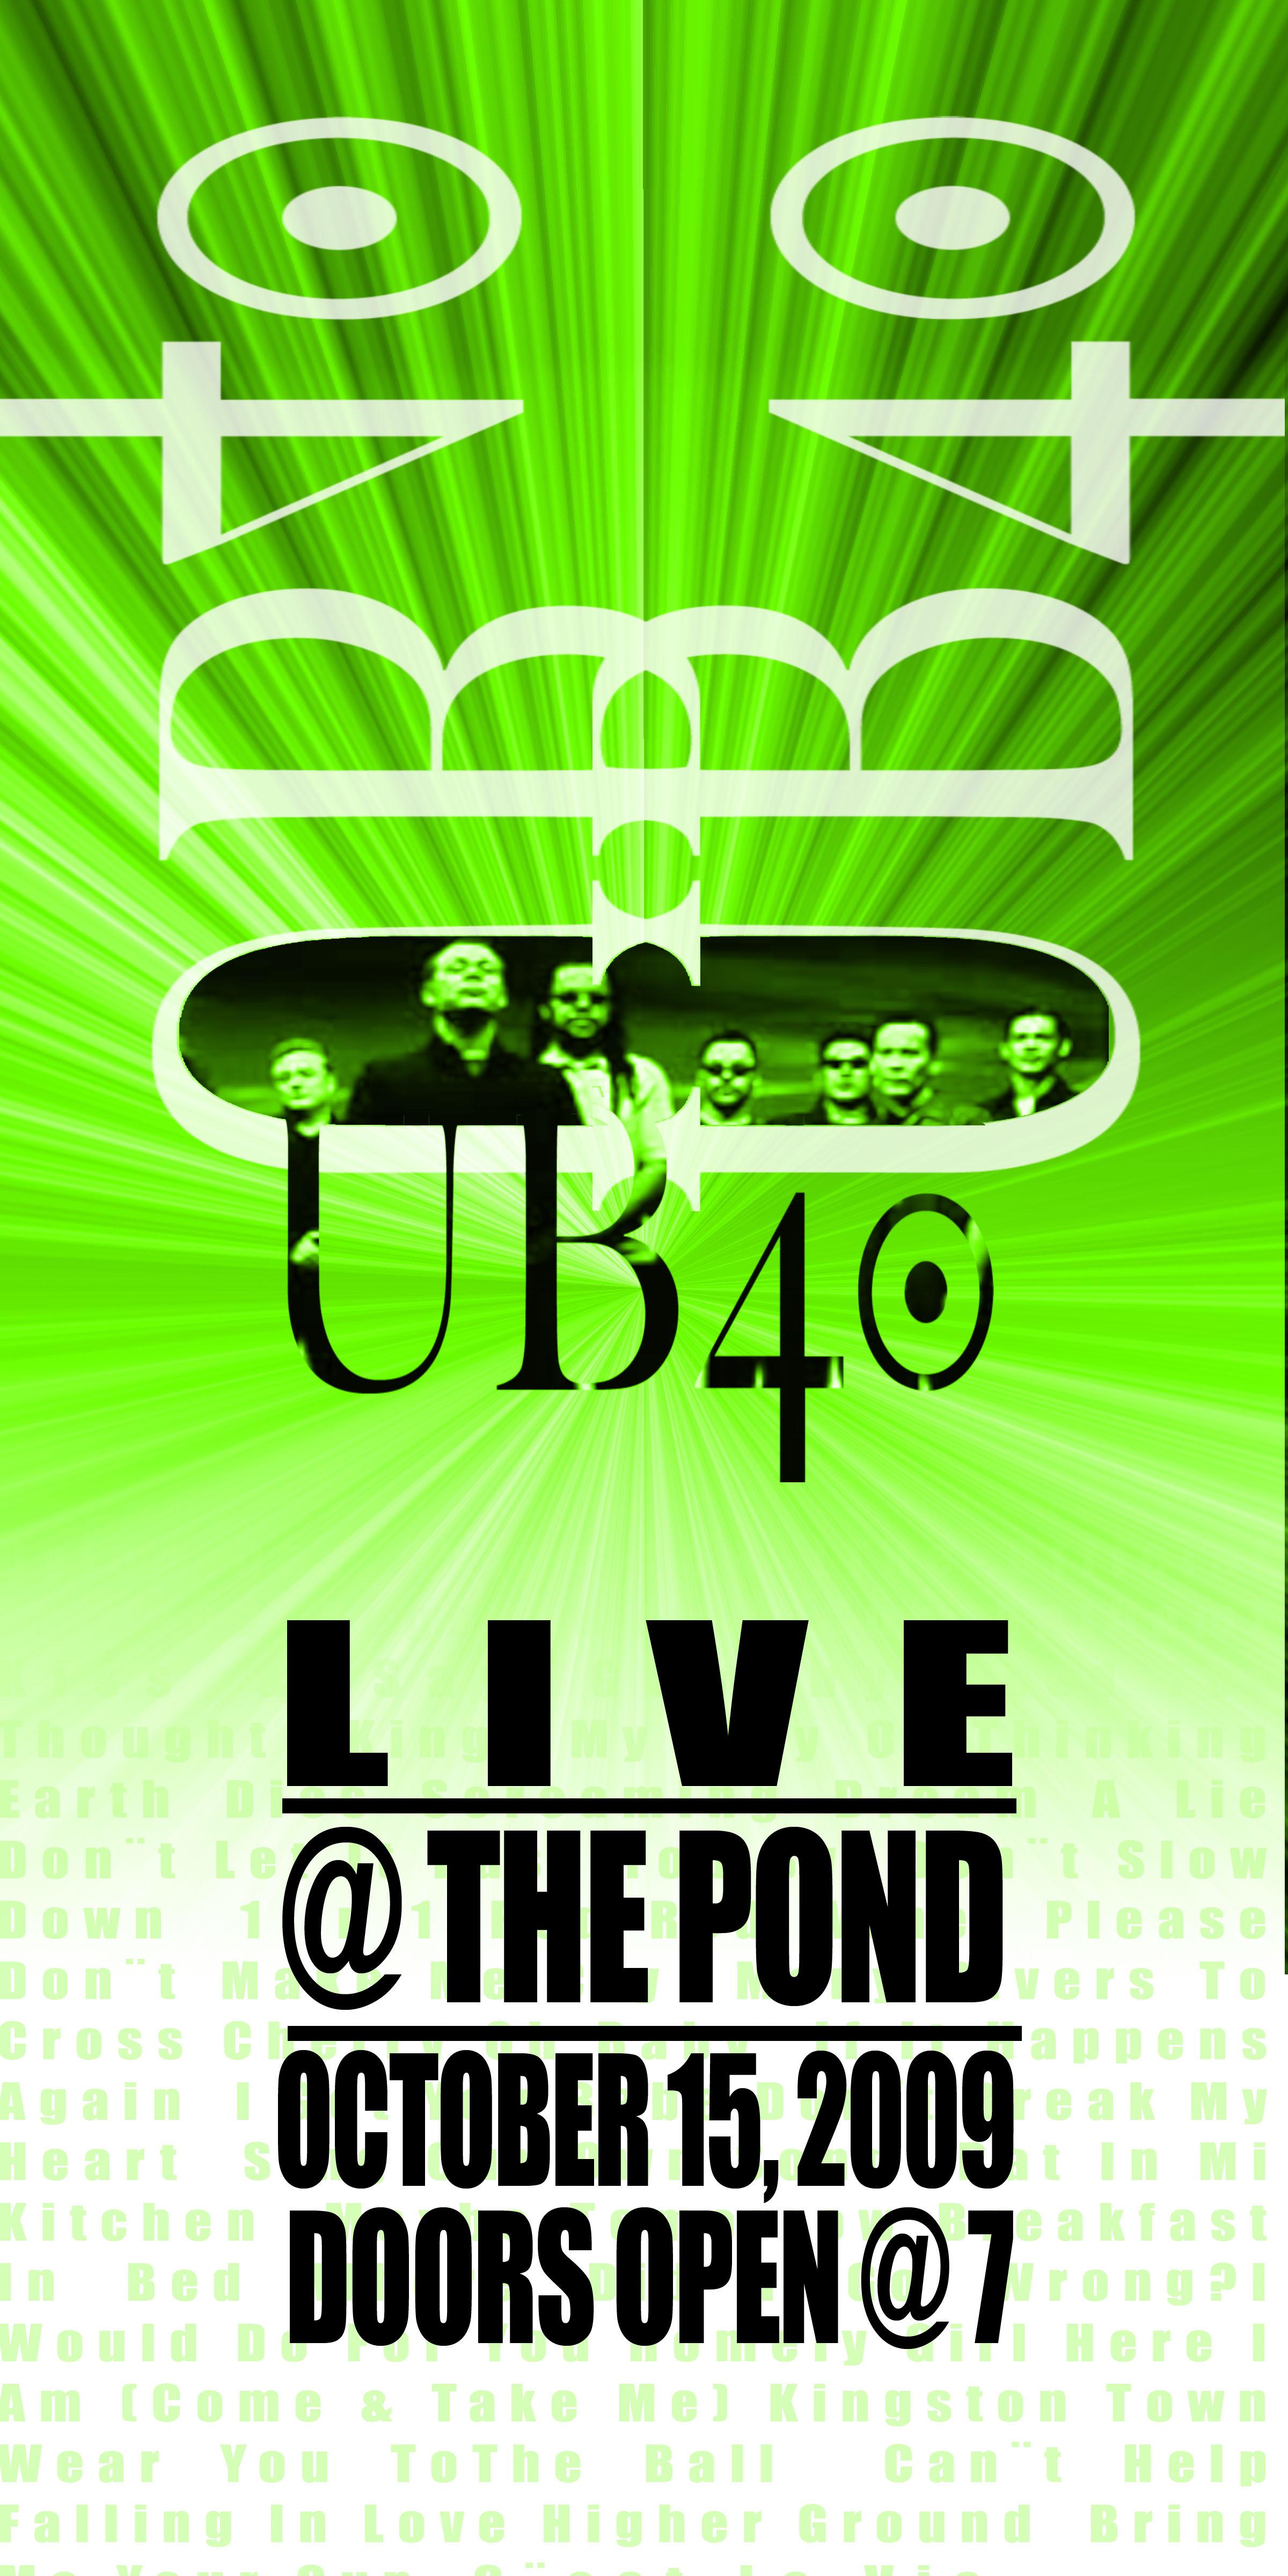 UB40 Banner